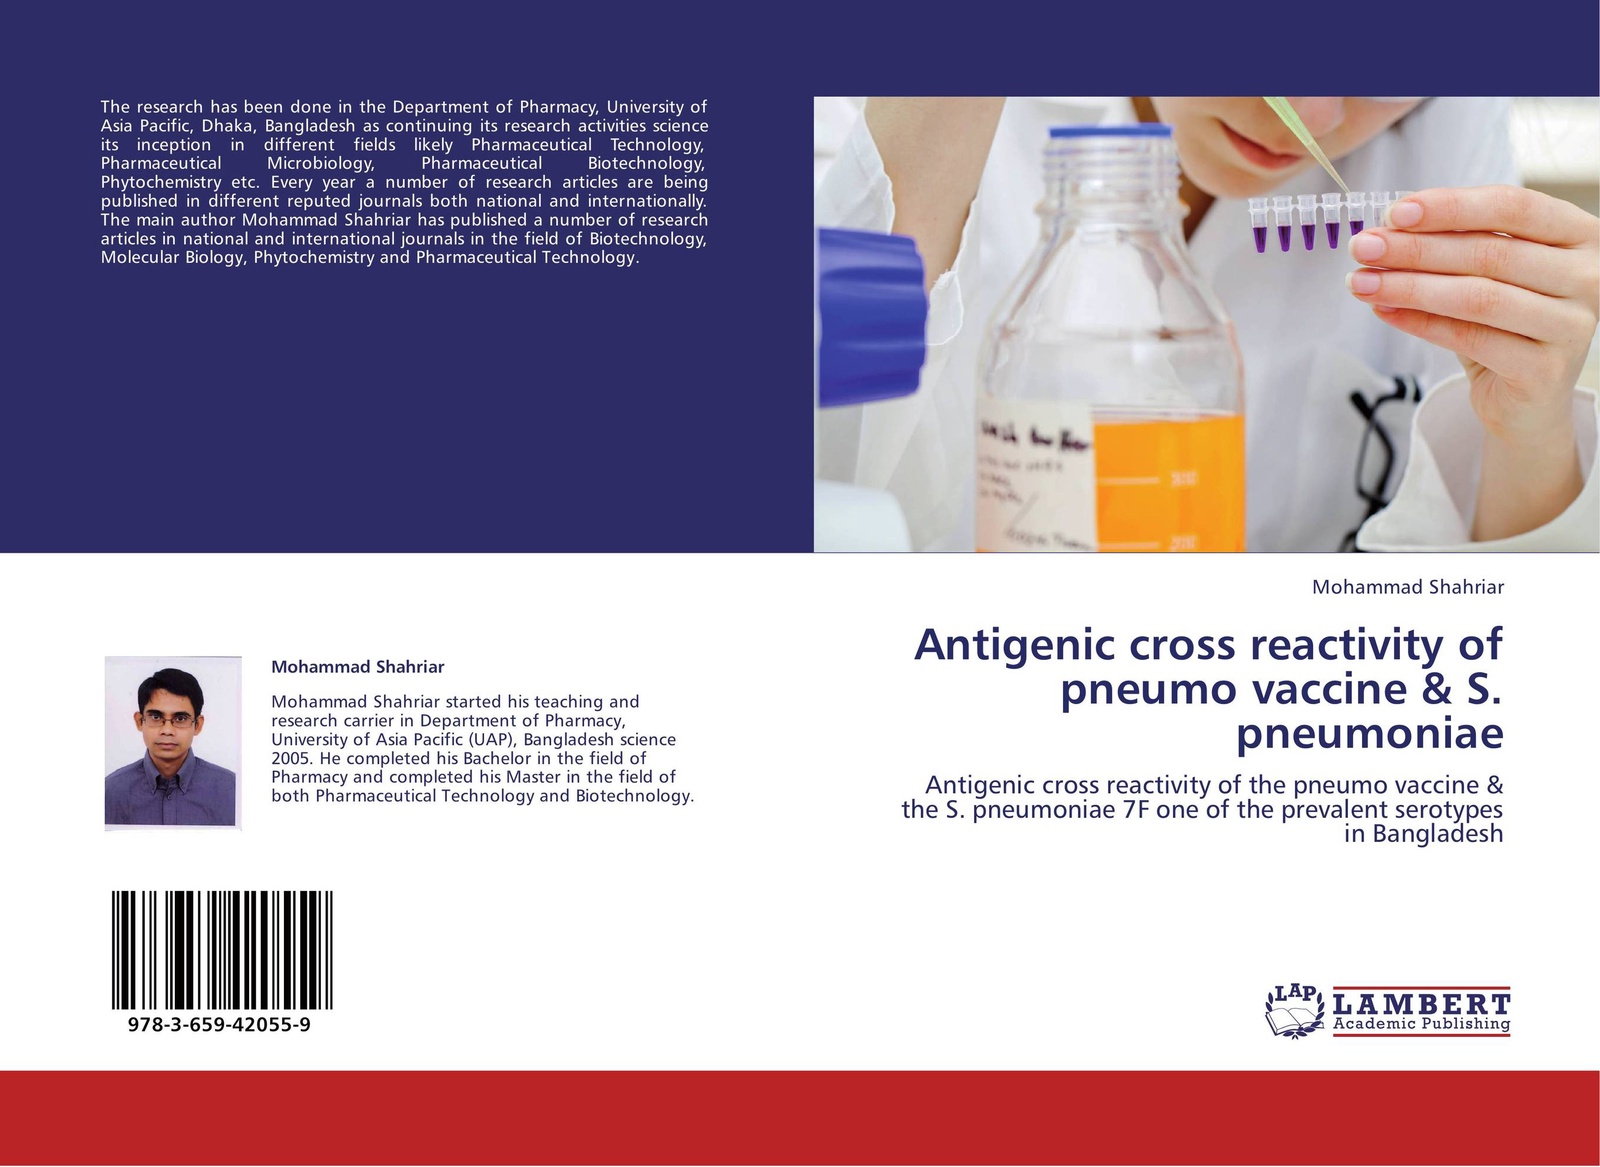 Mohammad Shahriar Antigenic cross reactivity of pneumo vaccine & S. pneumoniae gaisford simon essentials of pharmaceutical preformulation